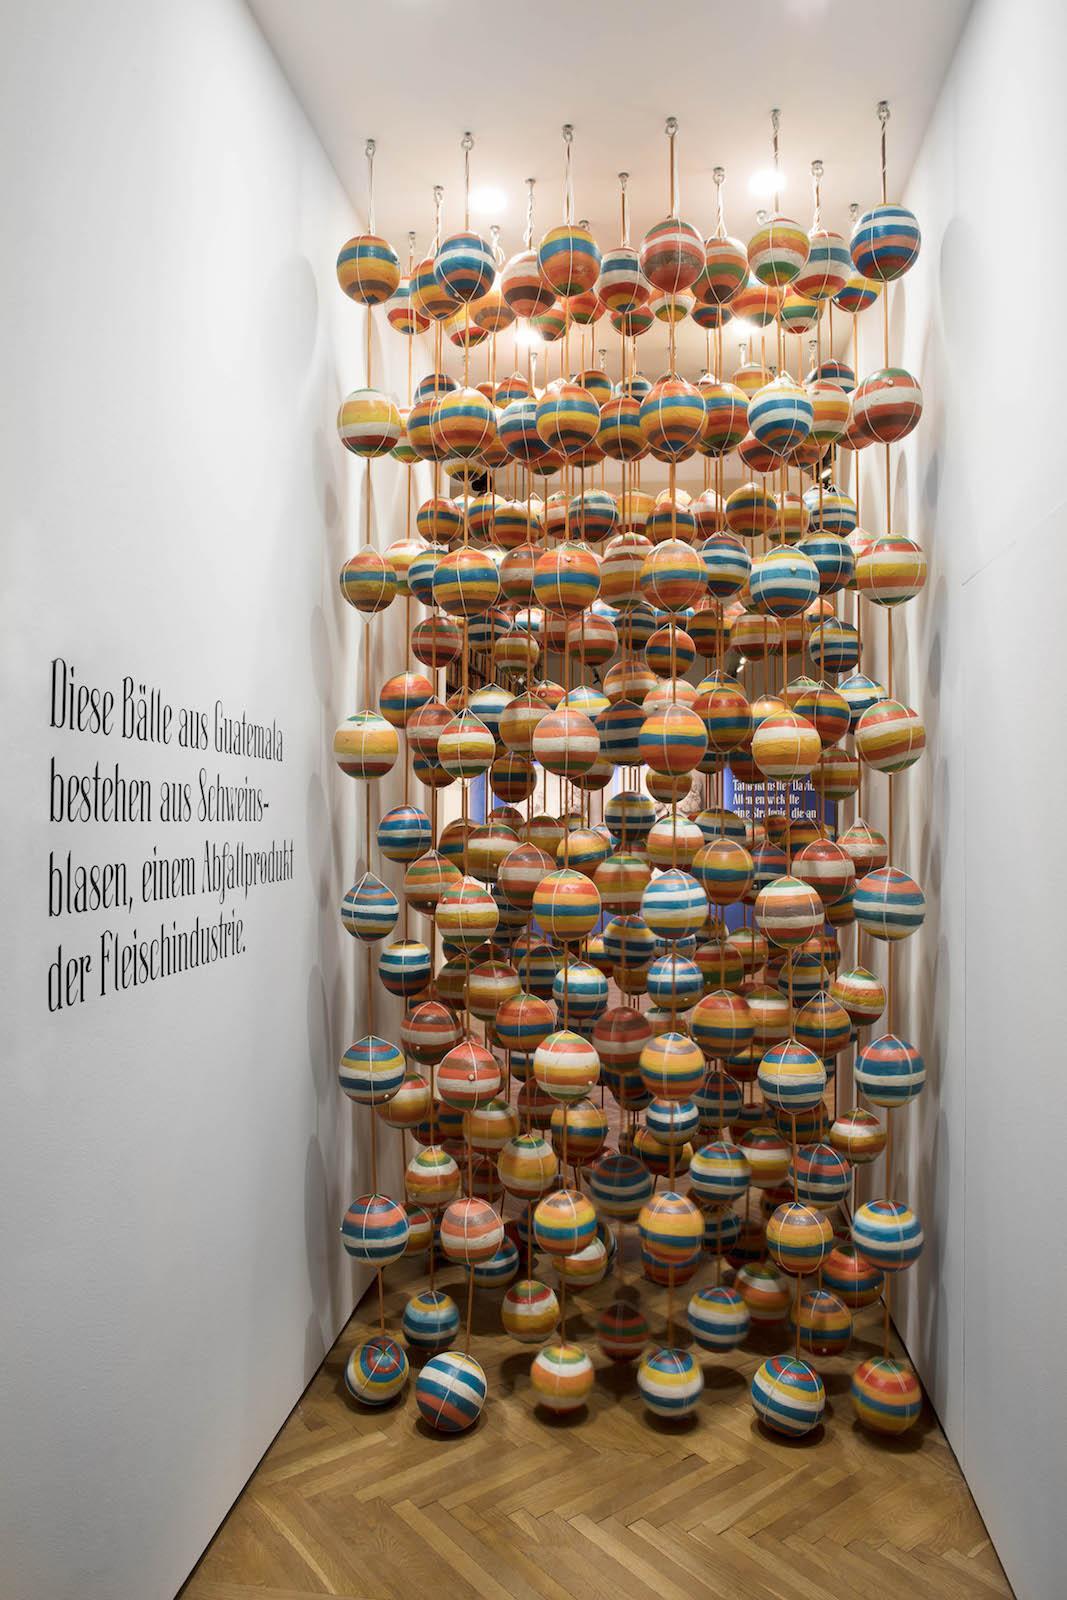 """SAGMEISTER & WALSH: Beauty"" (2018) Exhibition view at MAK Sagmeister & Walsh, painted balls made of pig's bladders(2018) © Aslan Kudrnofsky/MAK"